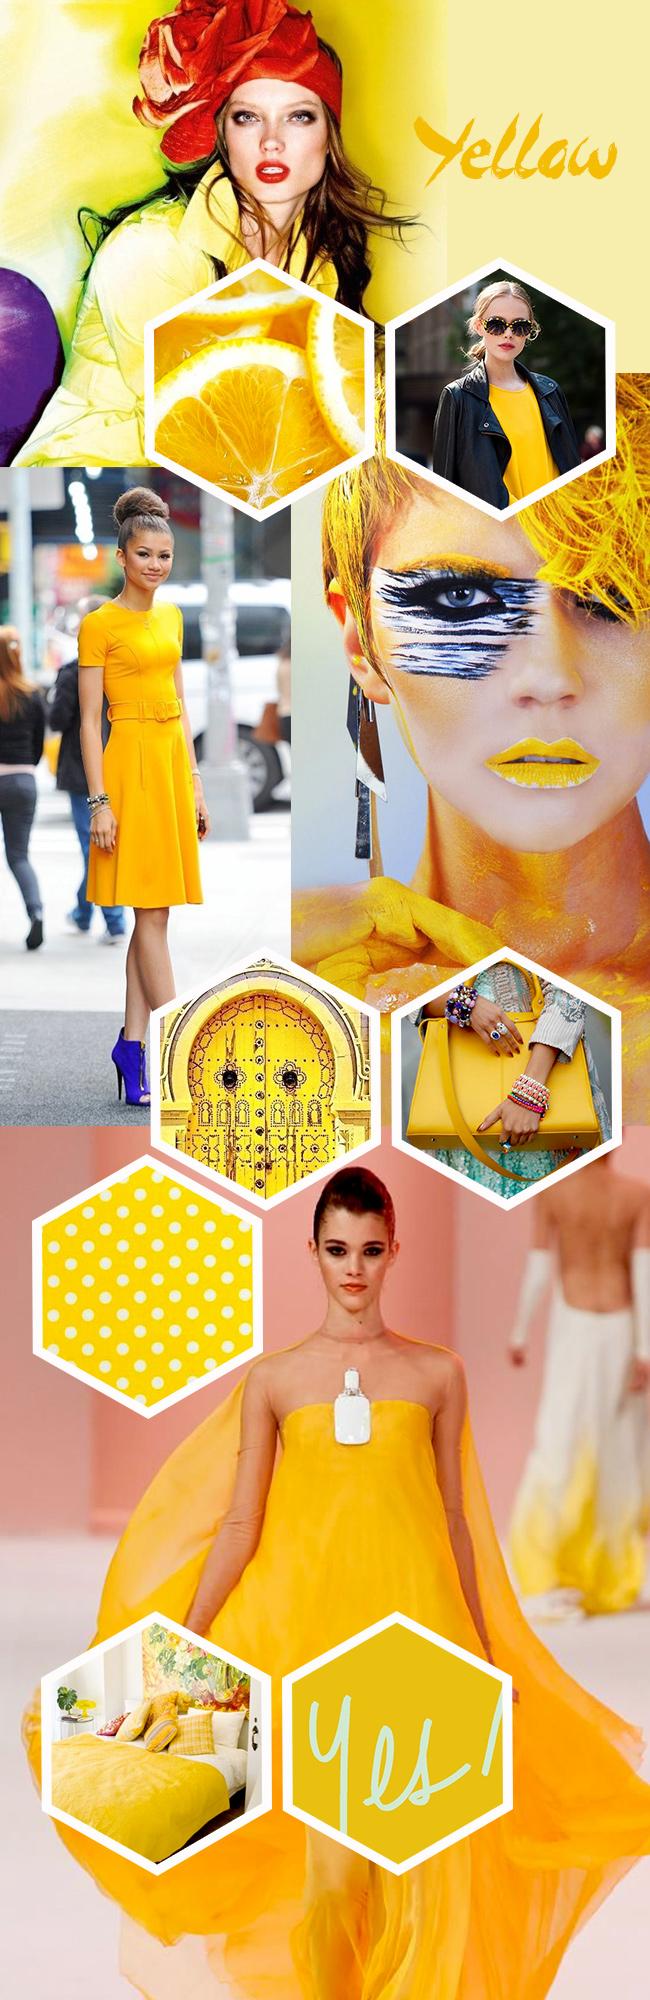 mood_board_yellow_01